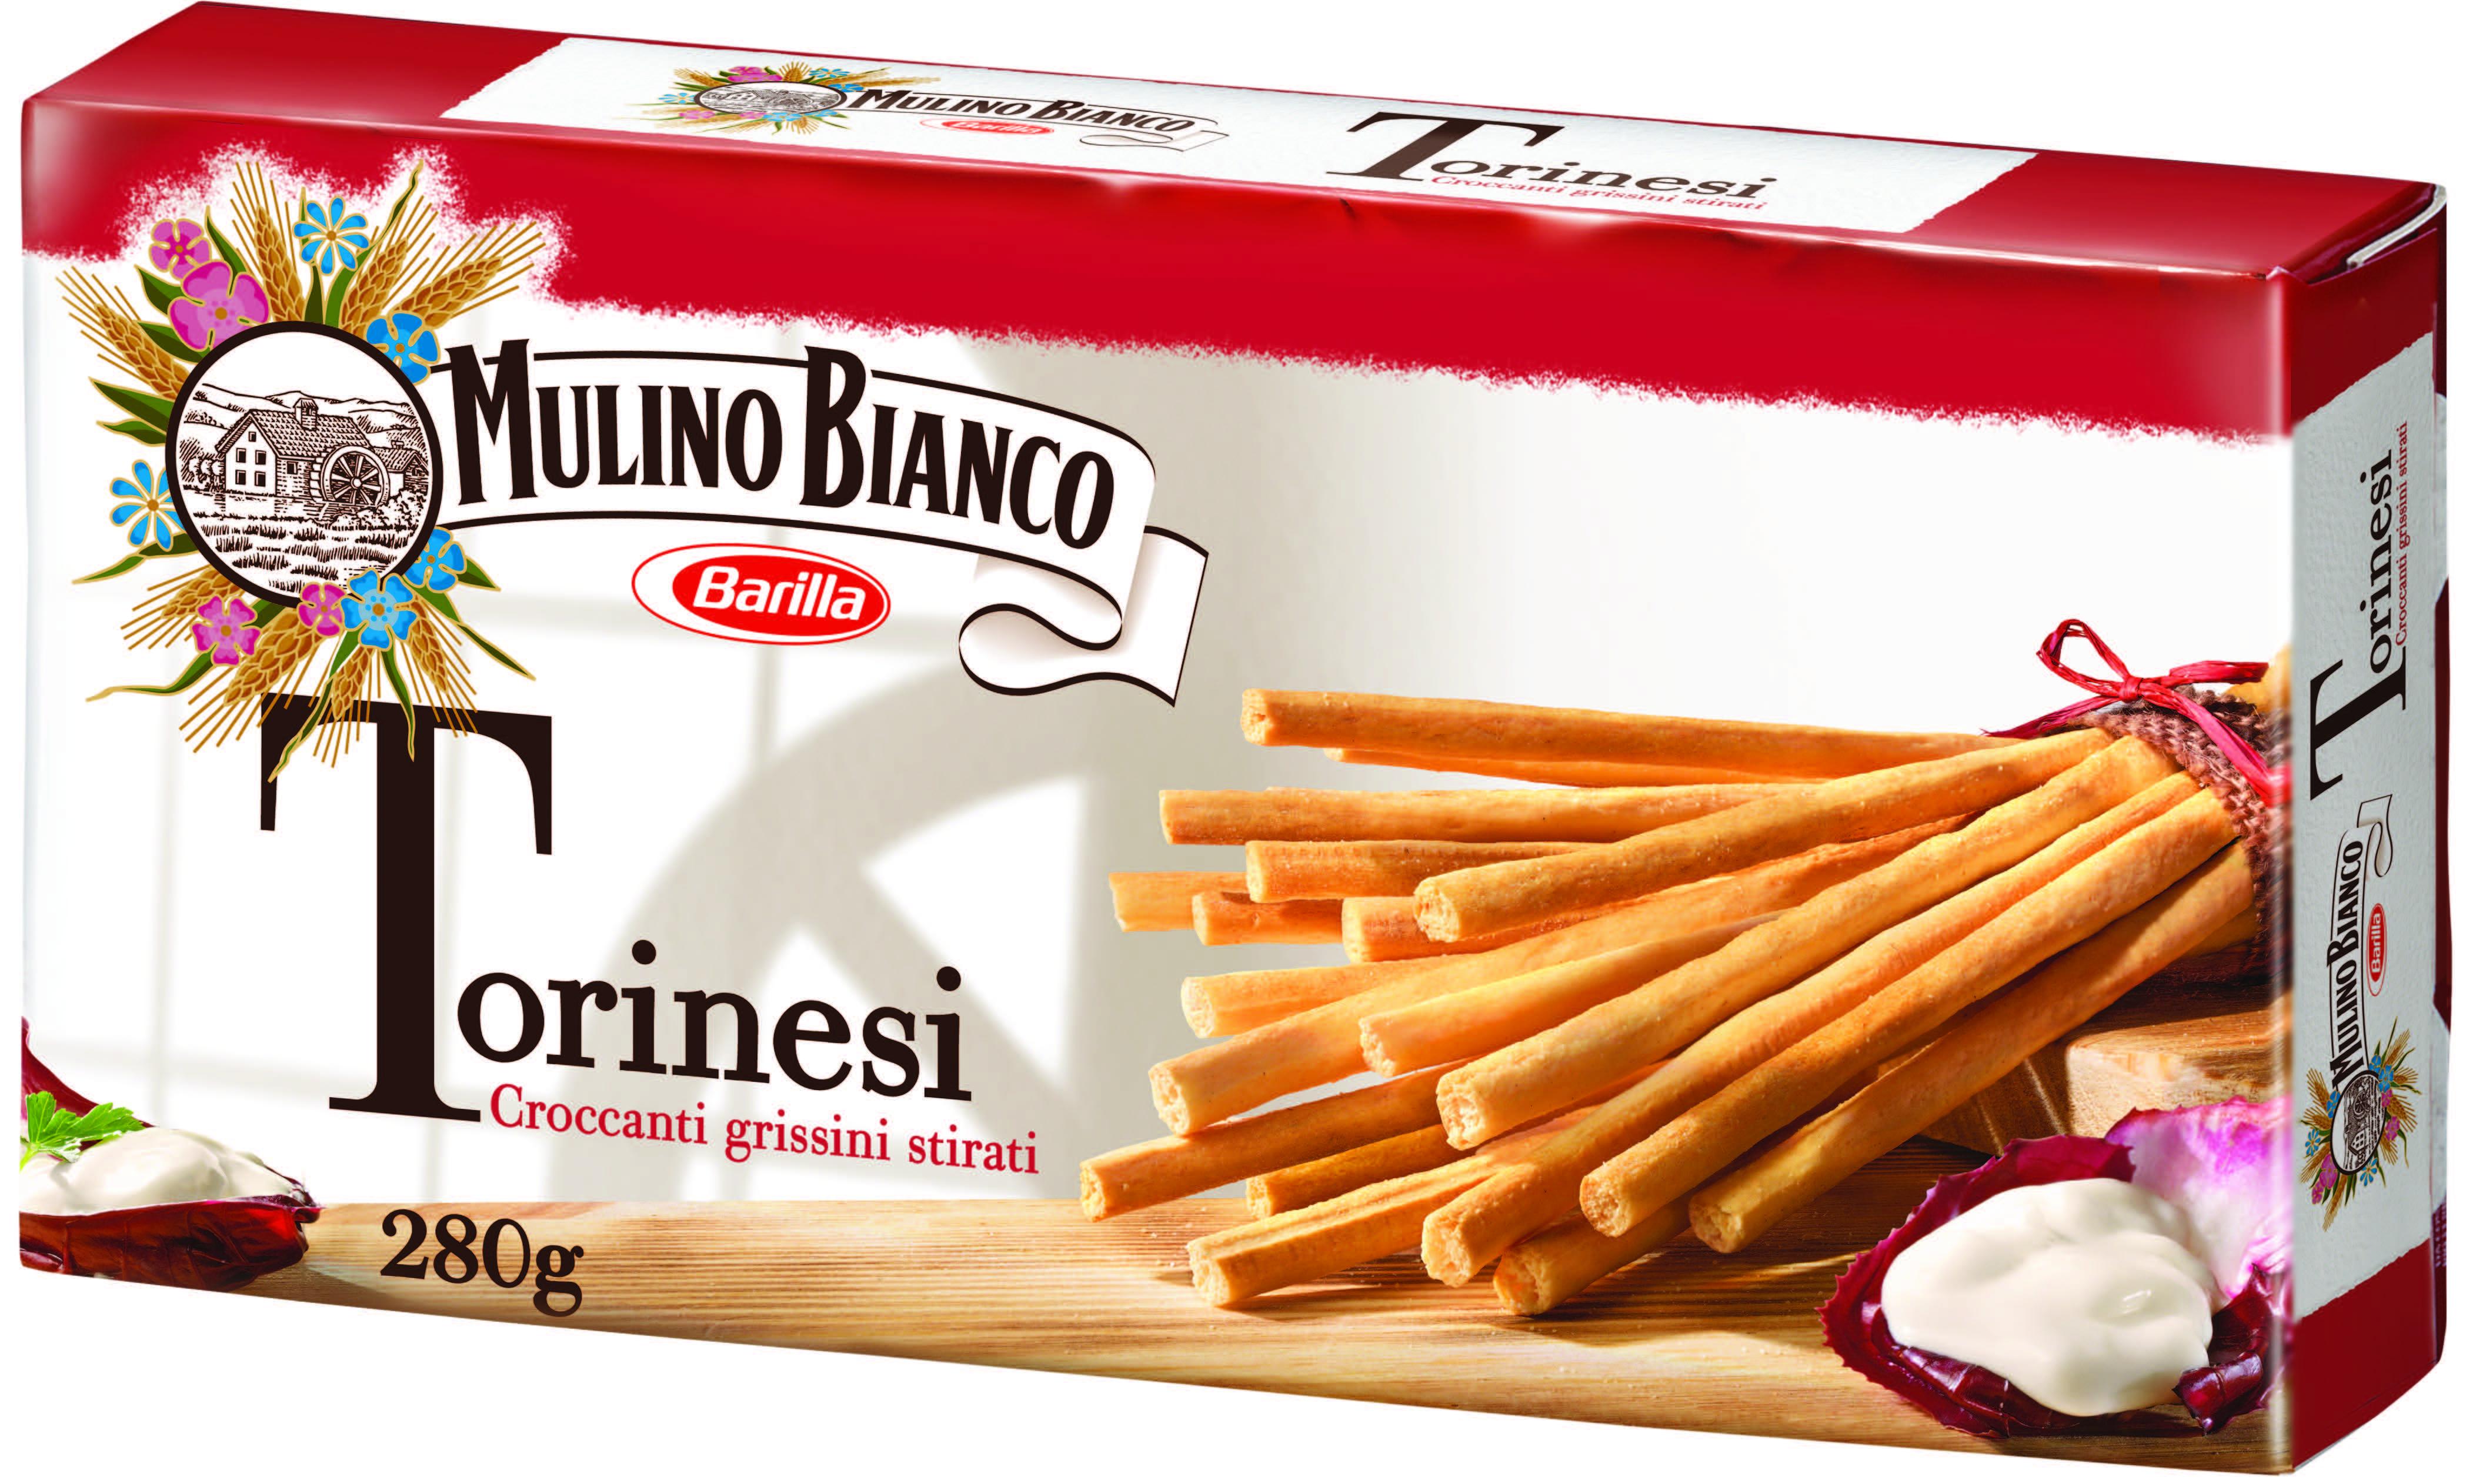 Grissini Torinesi Mulino Bianco   Mulino Bianco   Offerte e promozioni ...